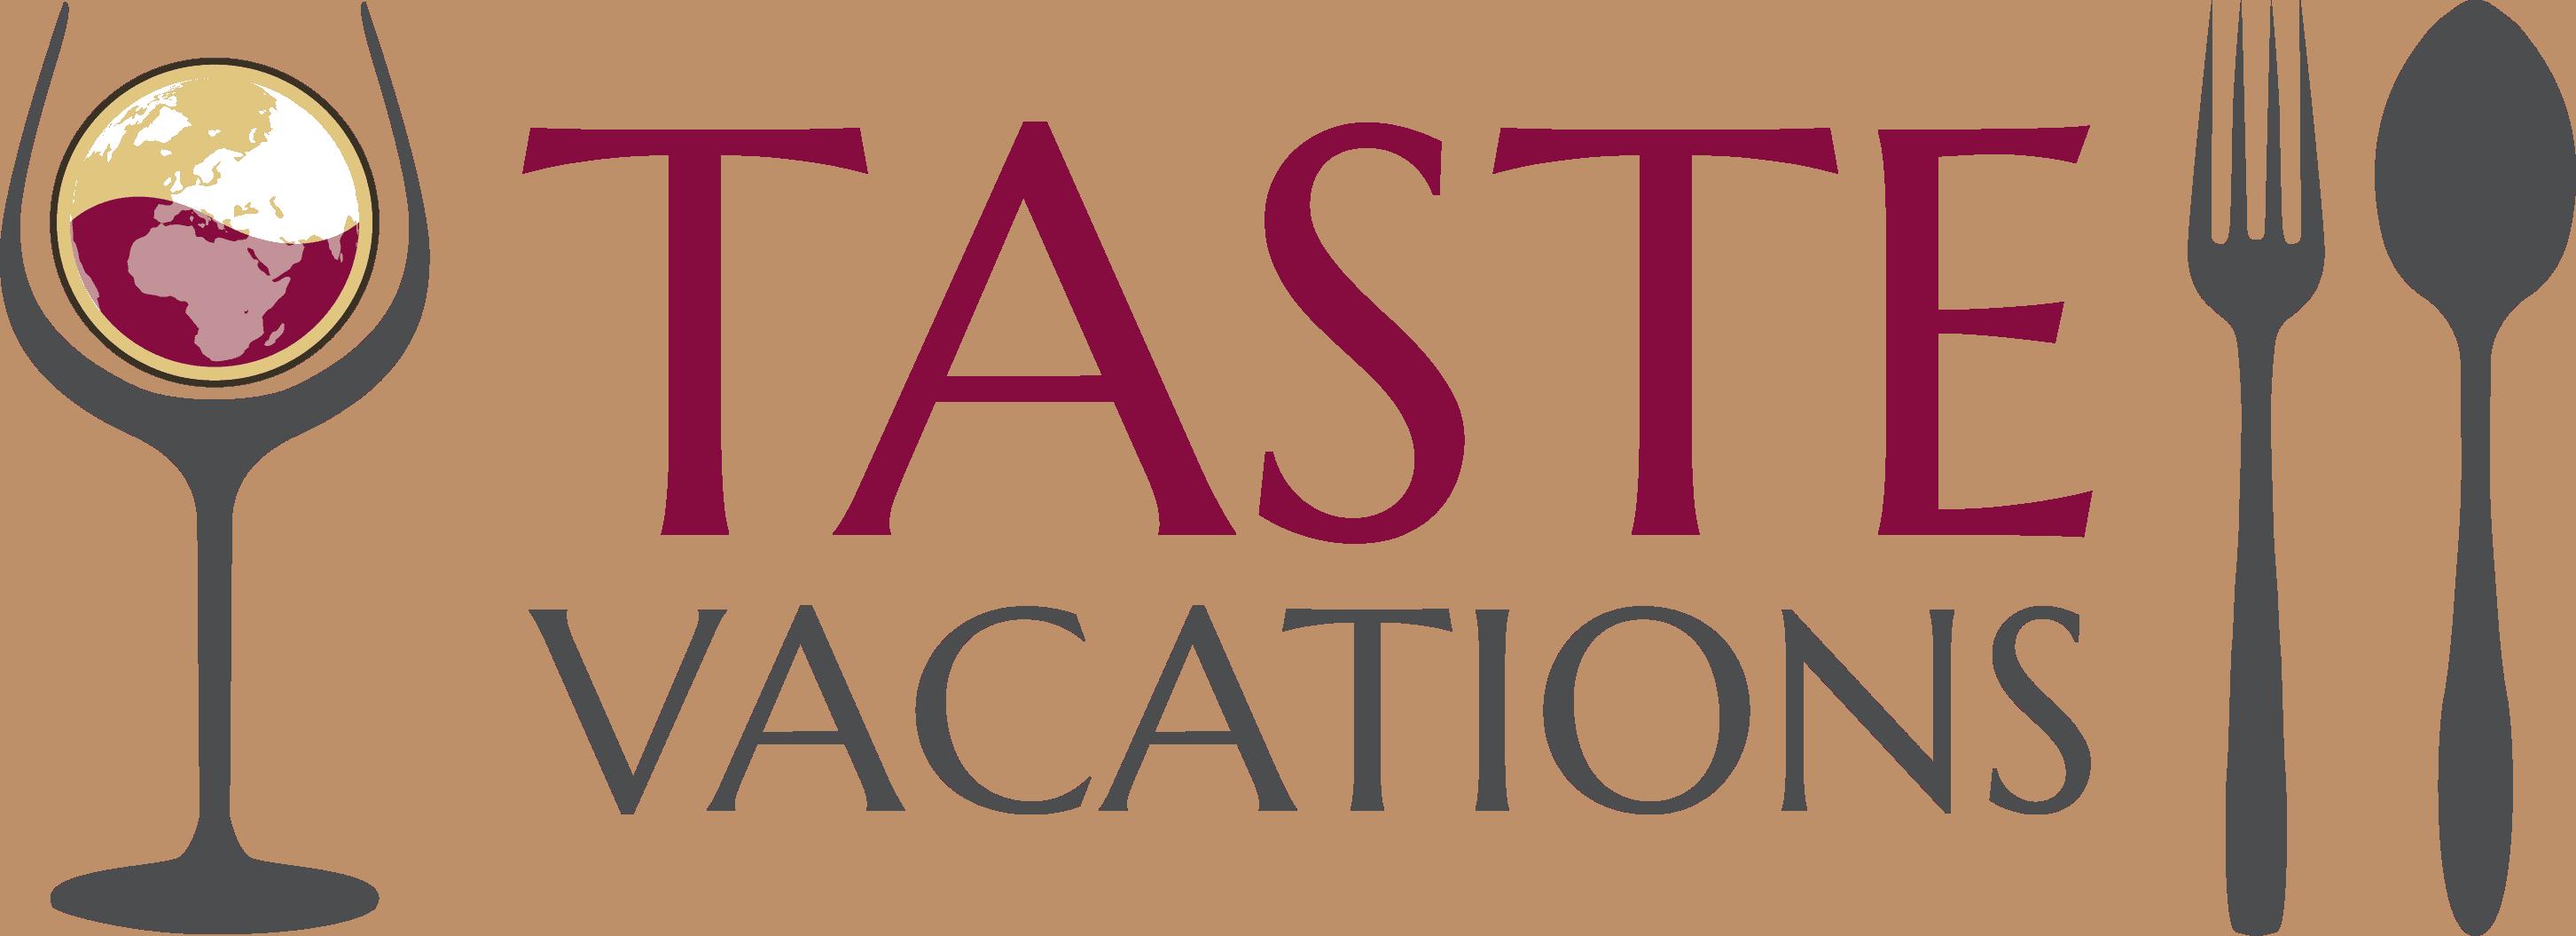 Taste Vacations